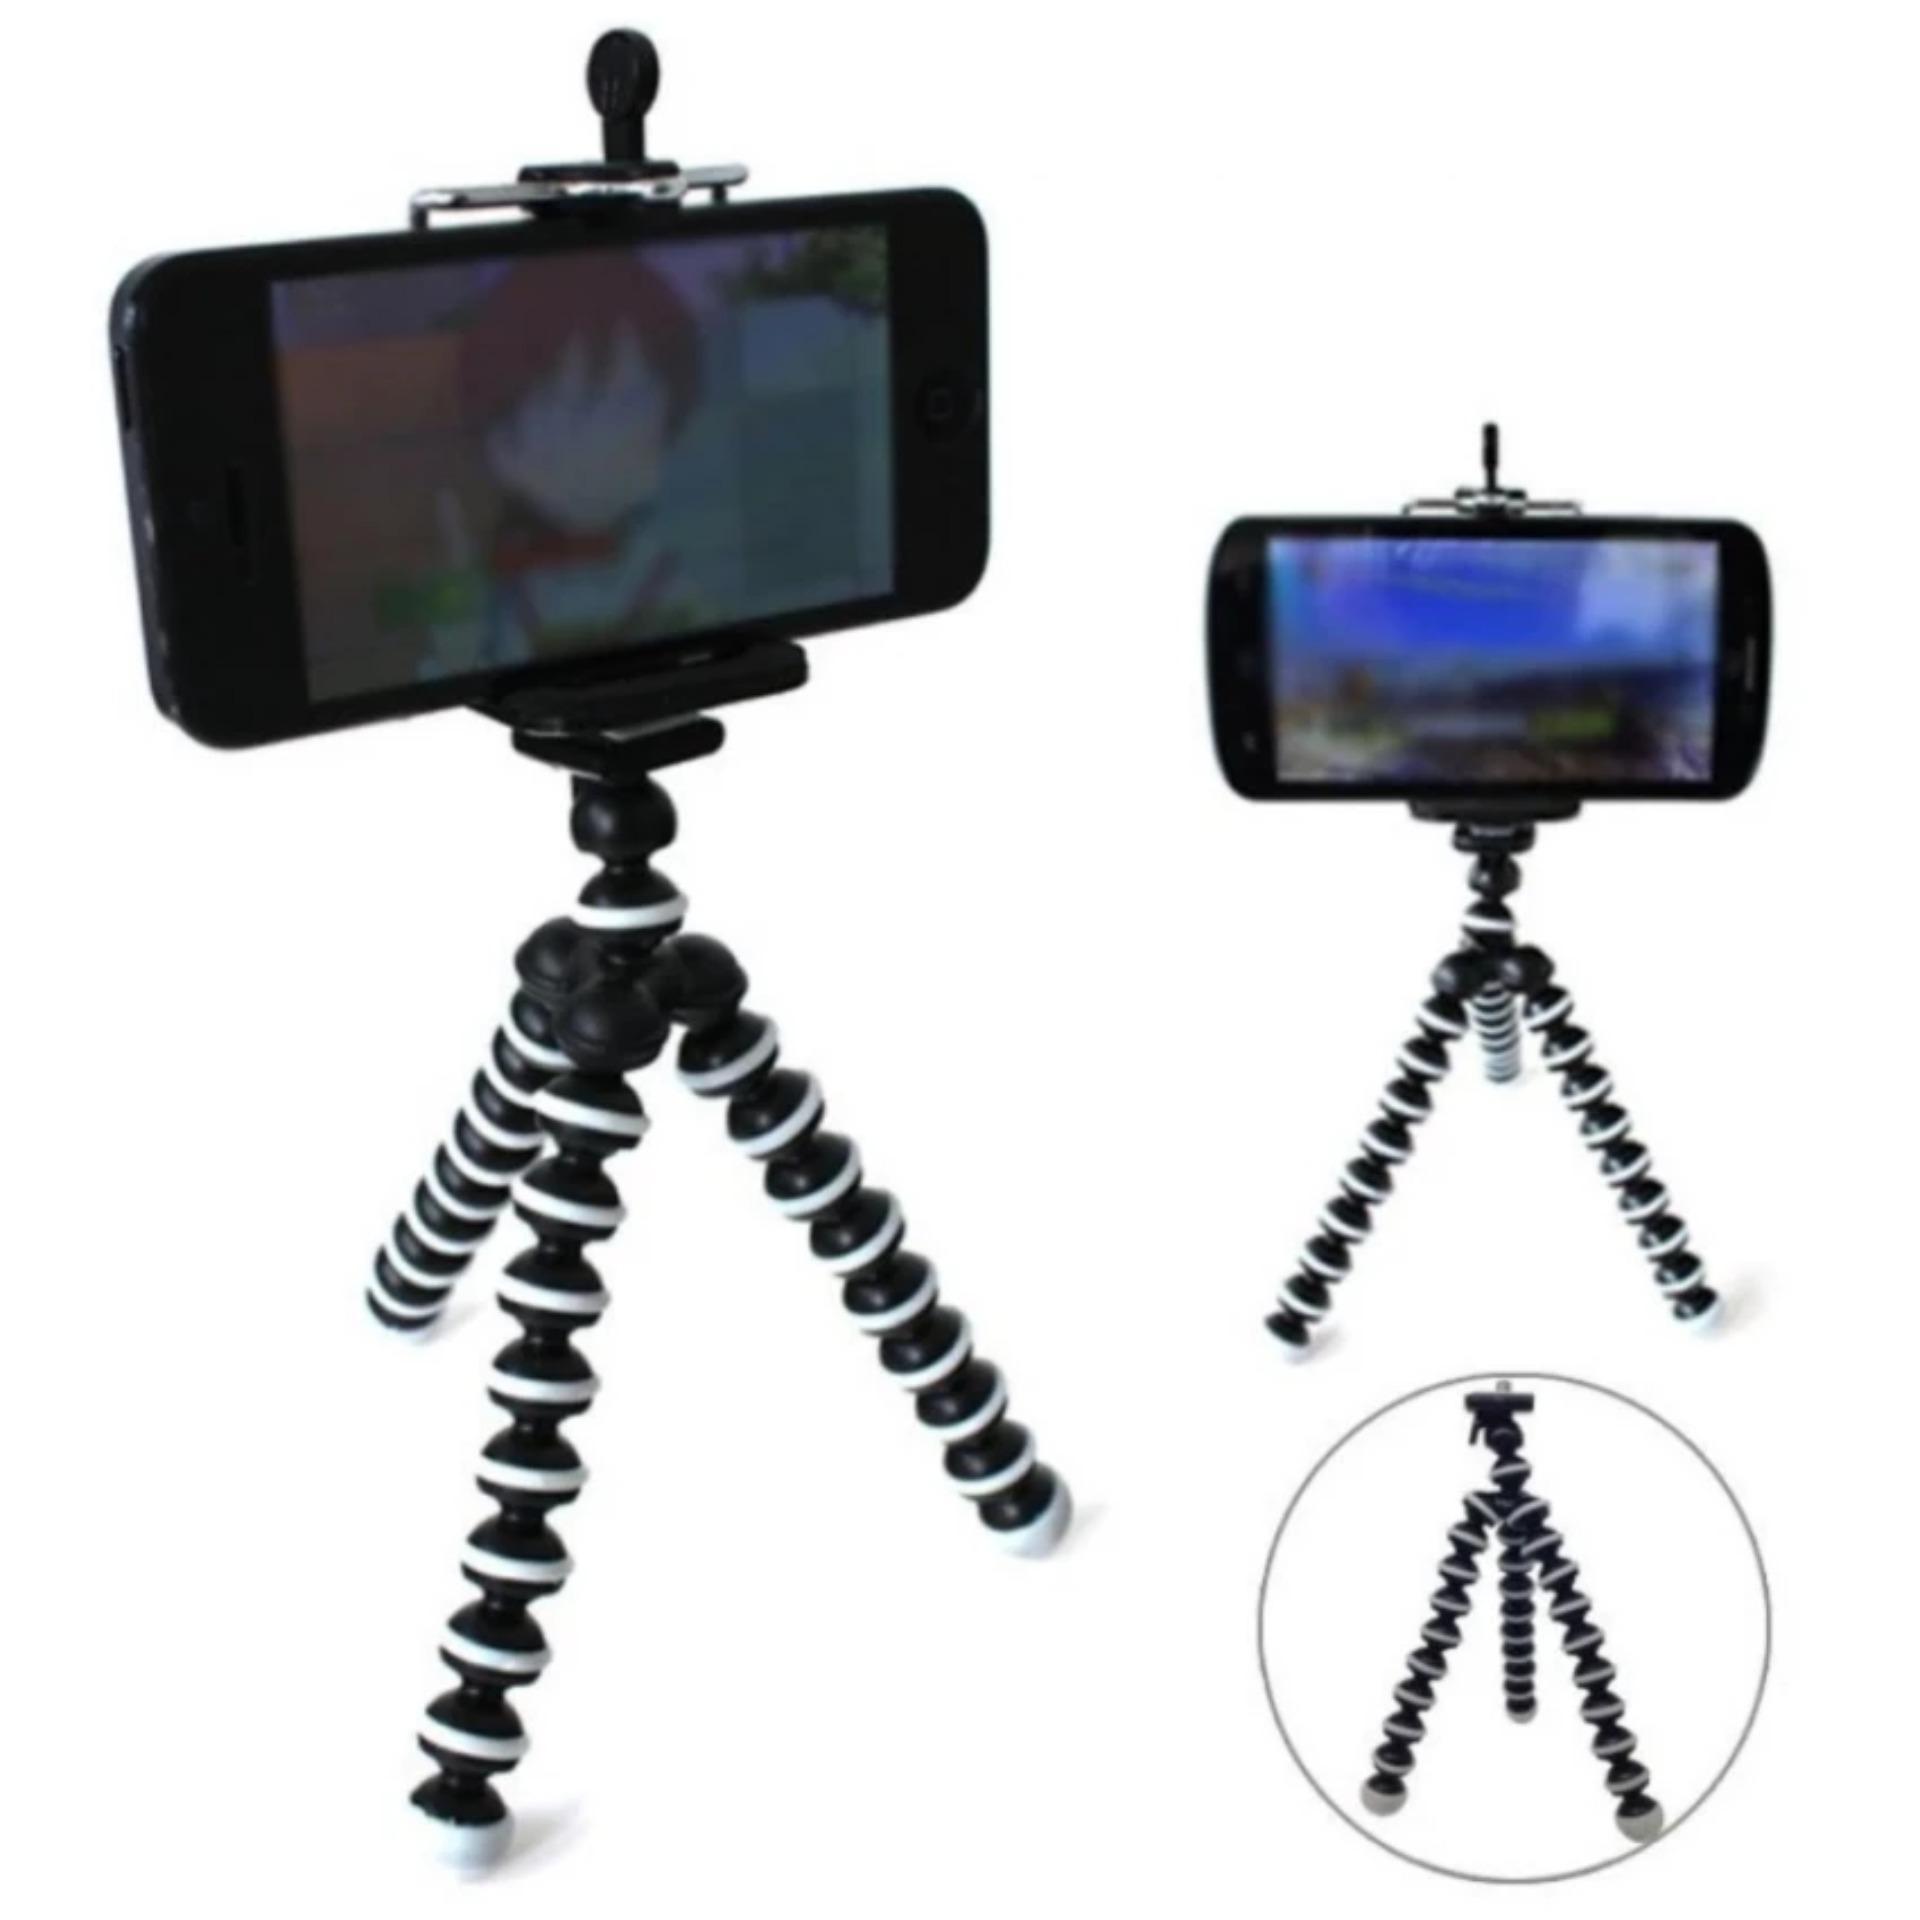 ... Mini Flexible Tripod Gorilla Pod Octopus + Holder U + Bonus Holder tentacle for Phone ...